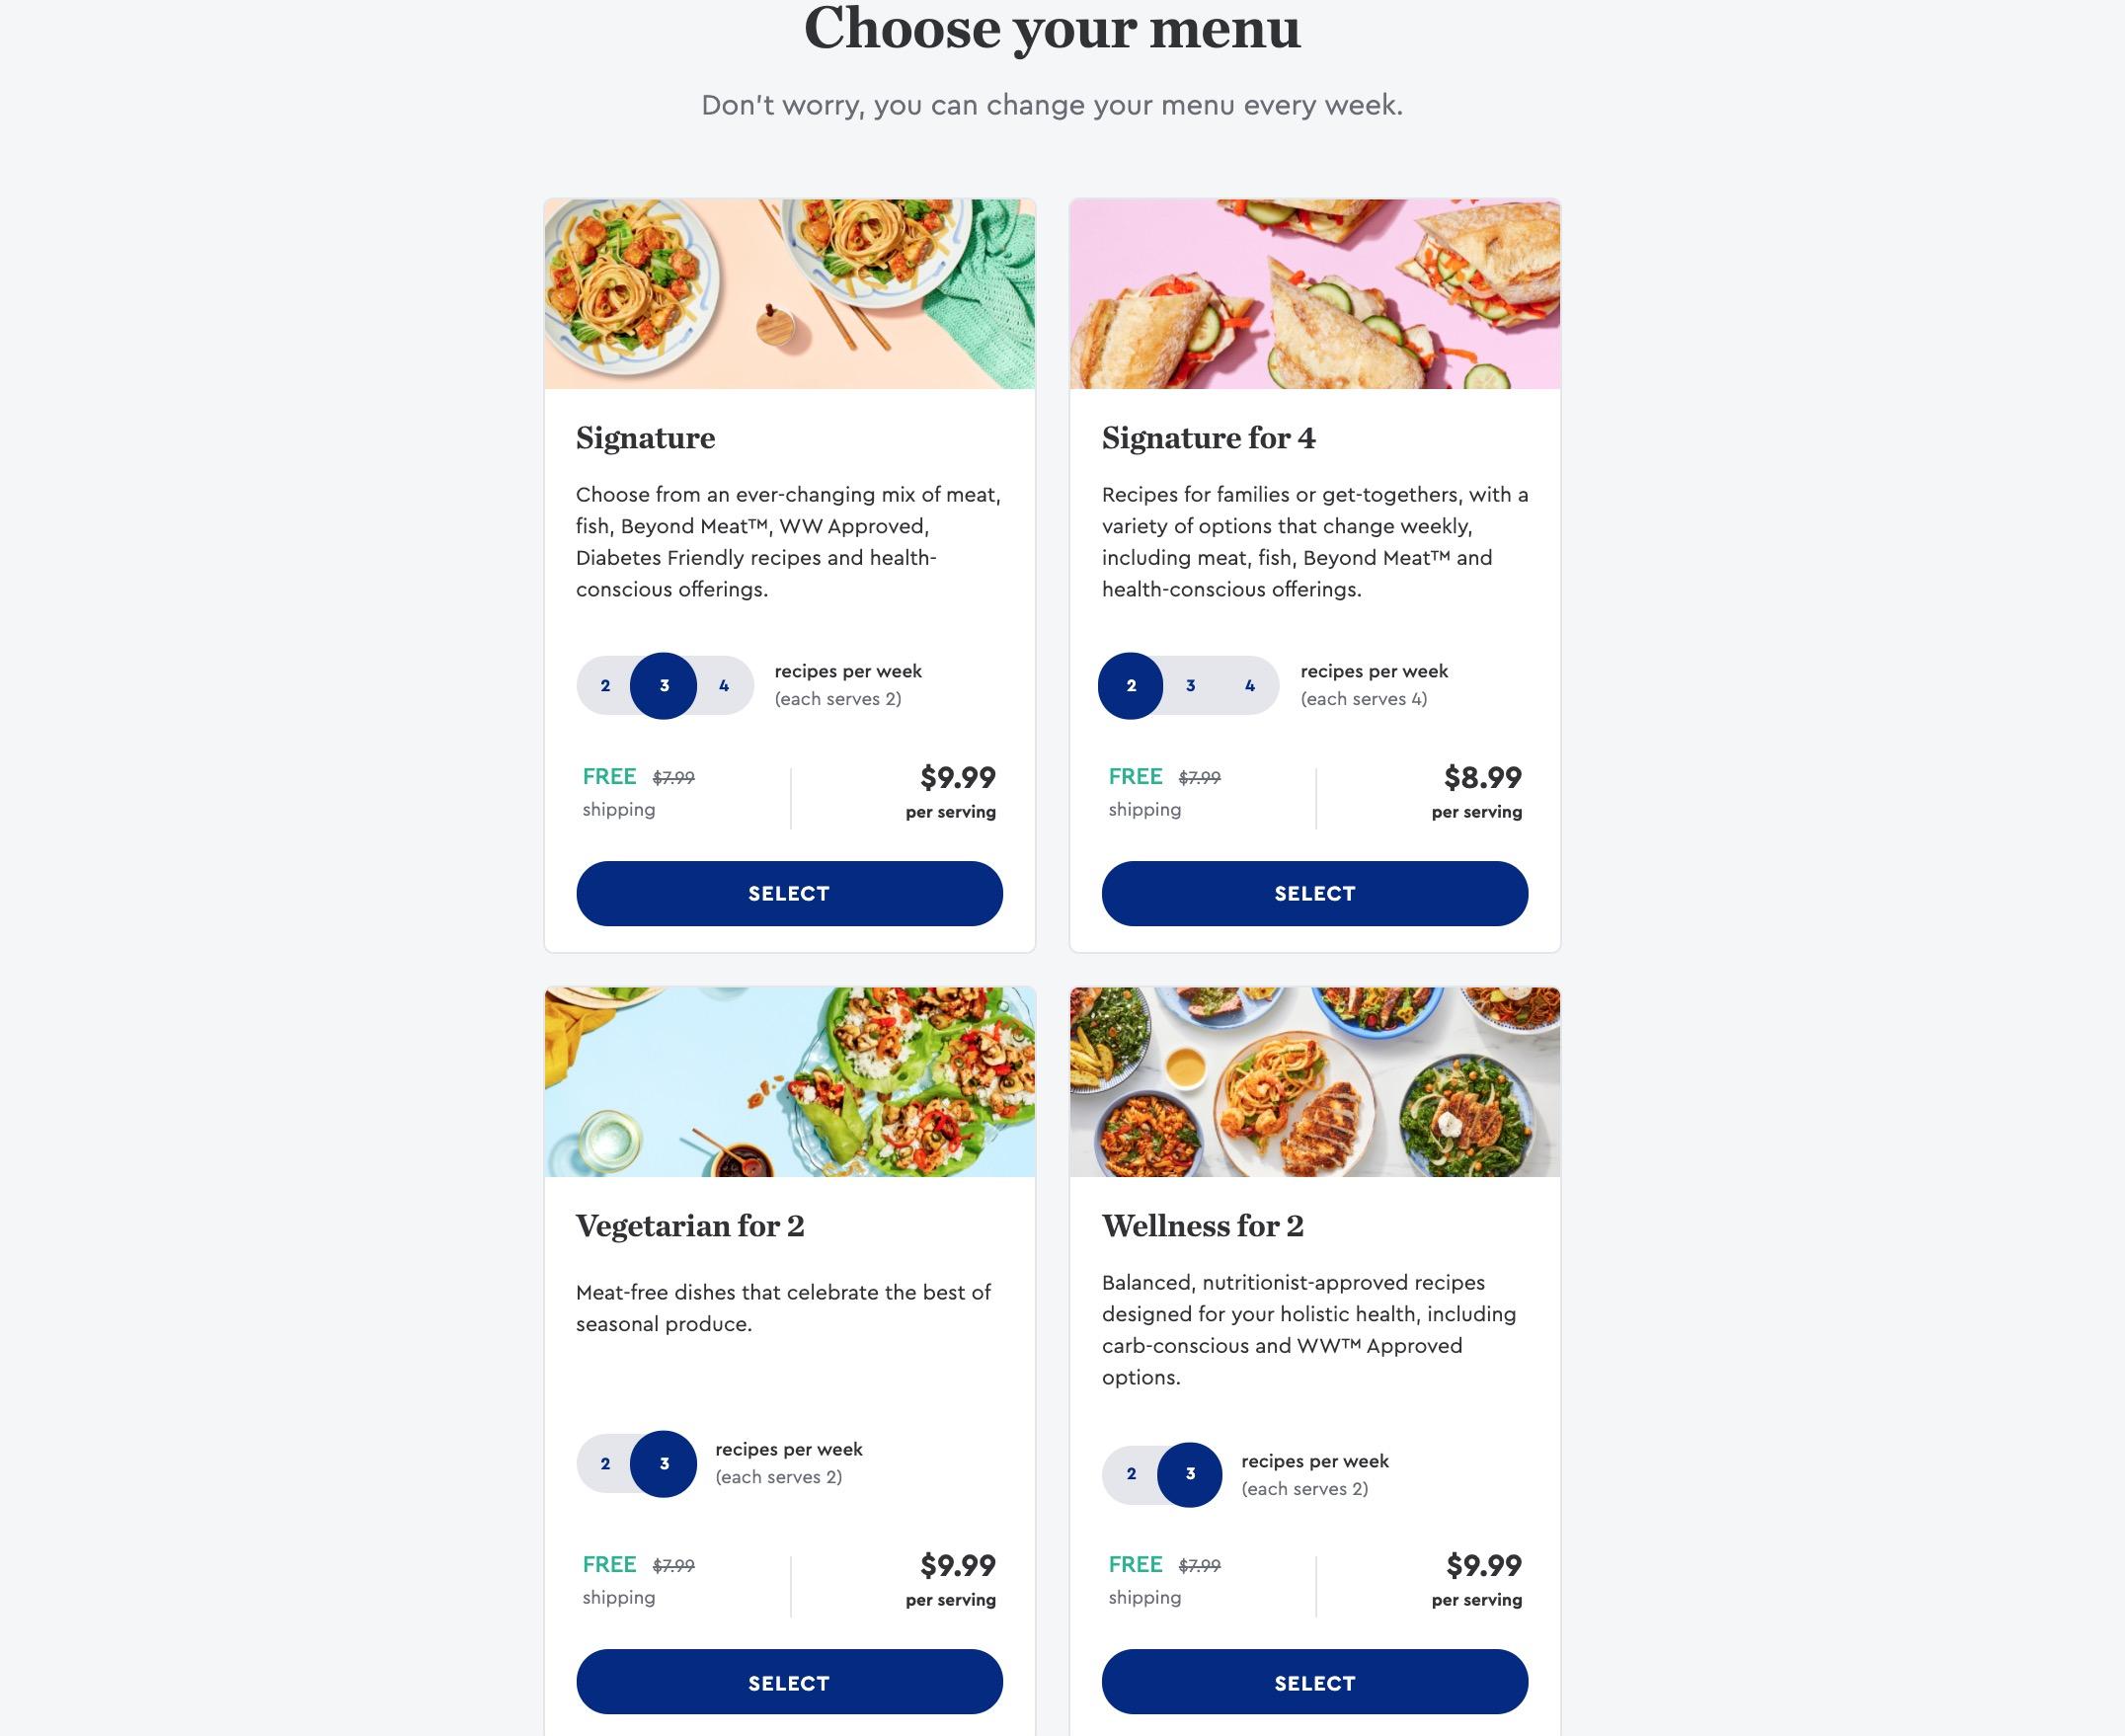 Blue Apron choose menu